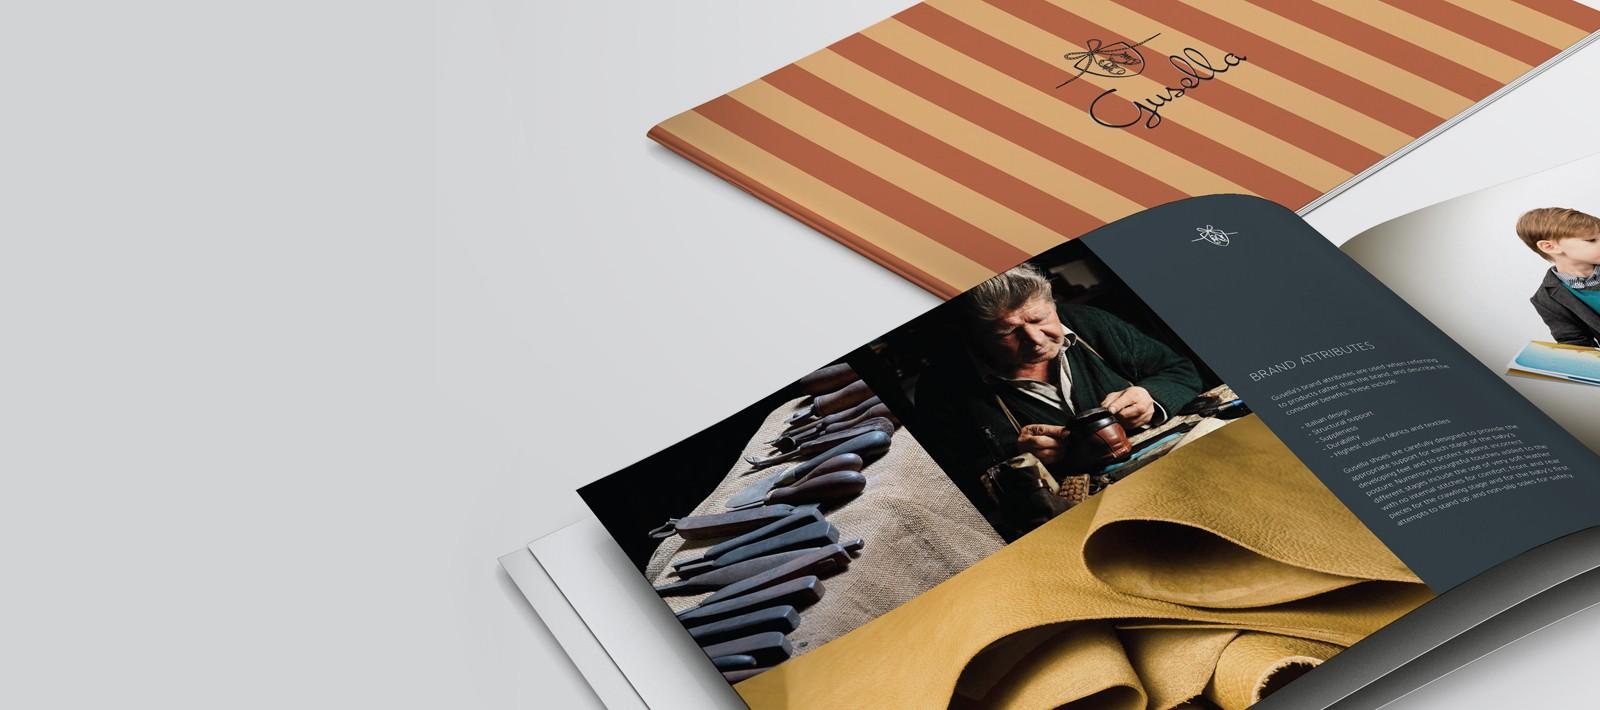 Brand book design for a kids shoe brand